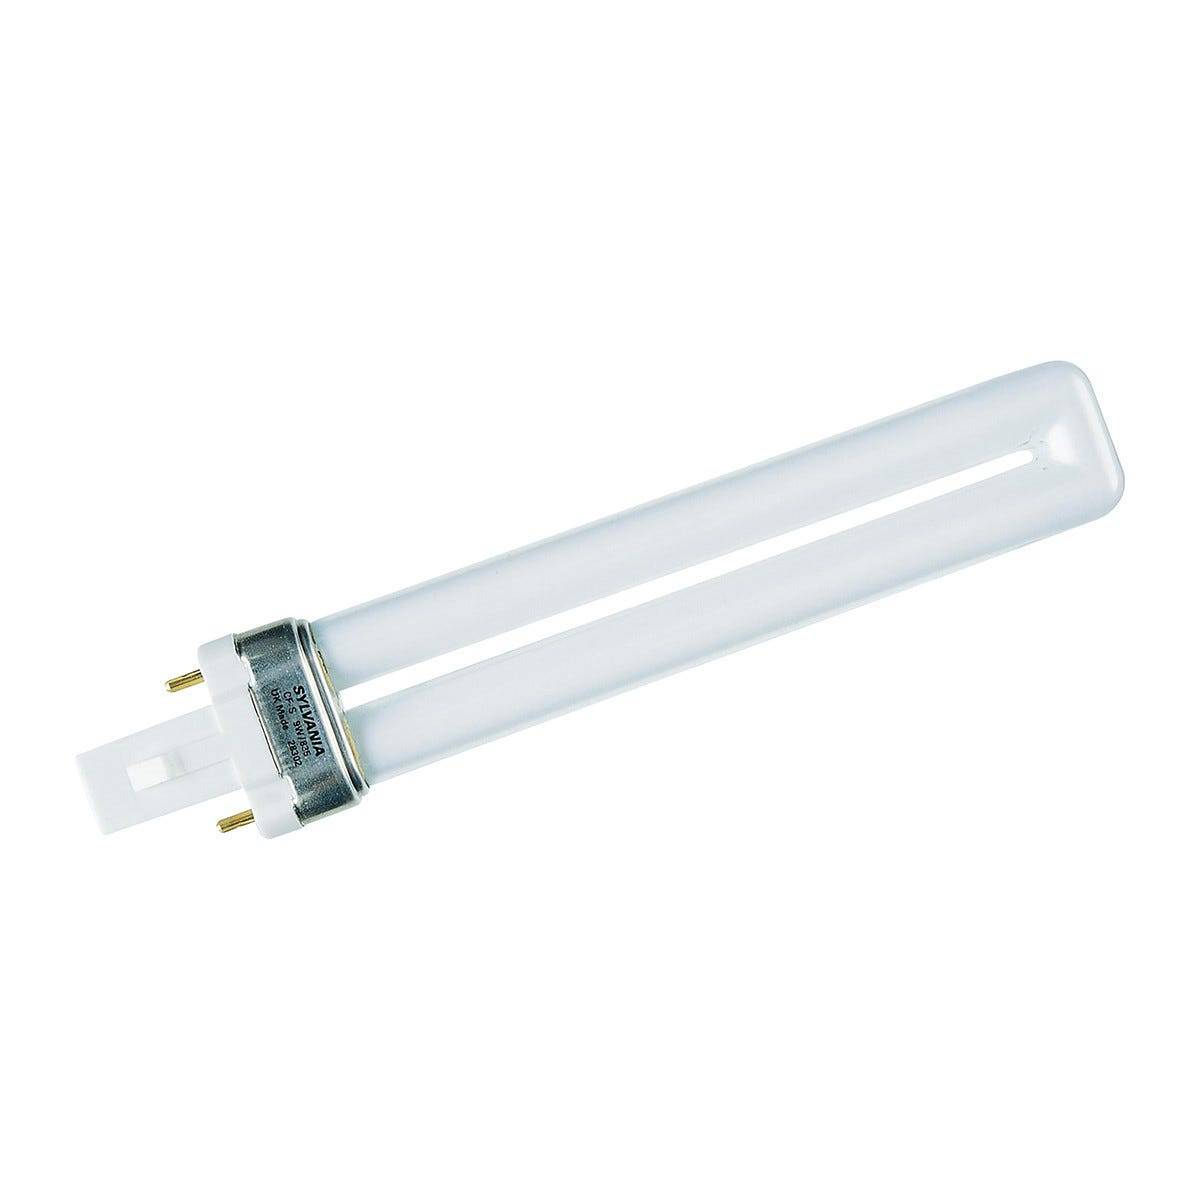 feilo_sylvania lampadina sylvania fluorescente 1 tubo lynx-s g23 11w 2 pin 900 lumen 4000k luce bianca